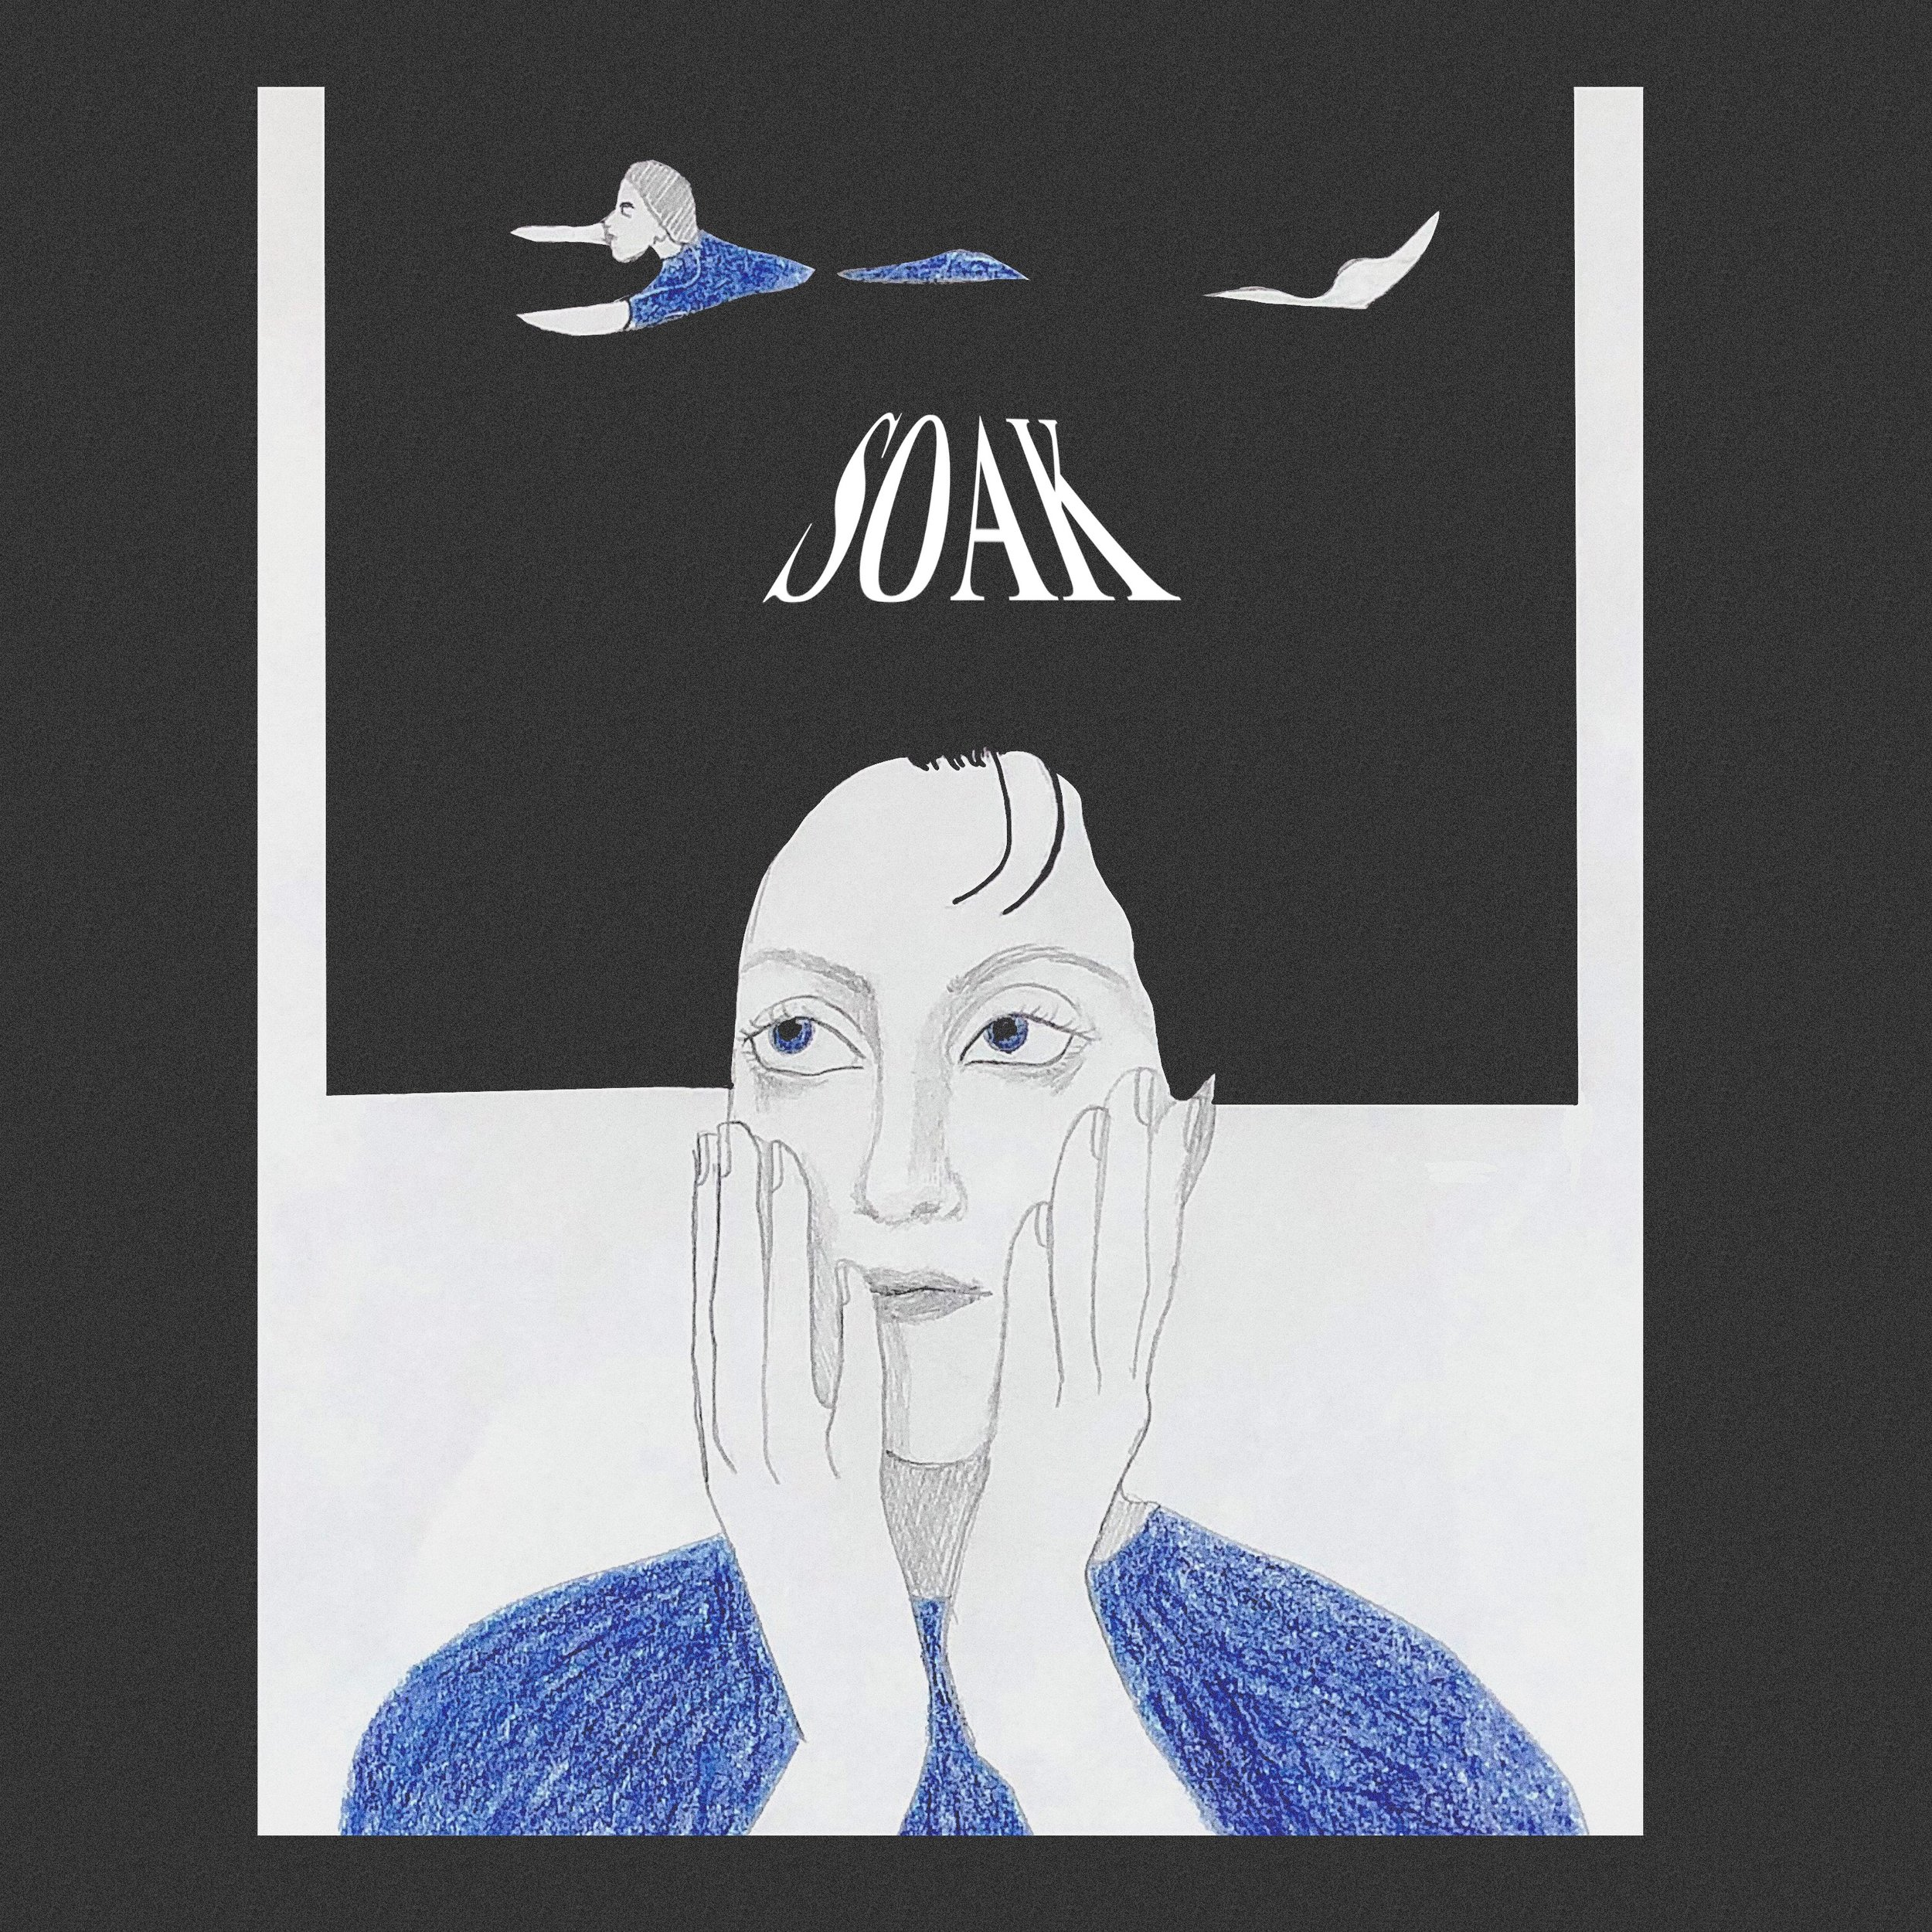 Album art for Kate Malanaphy's Soak by Morgan Peterson.